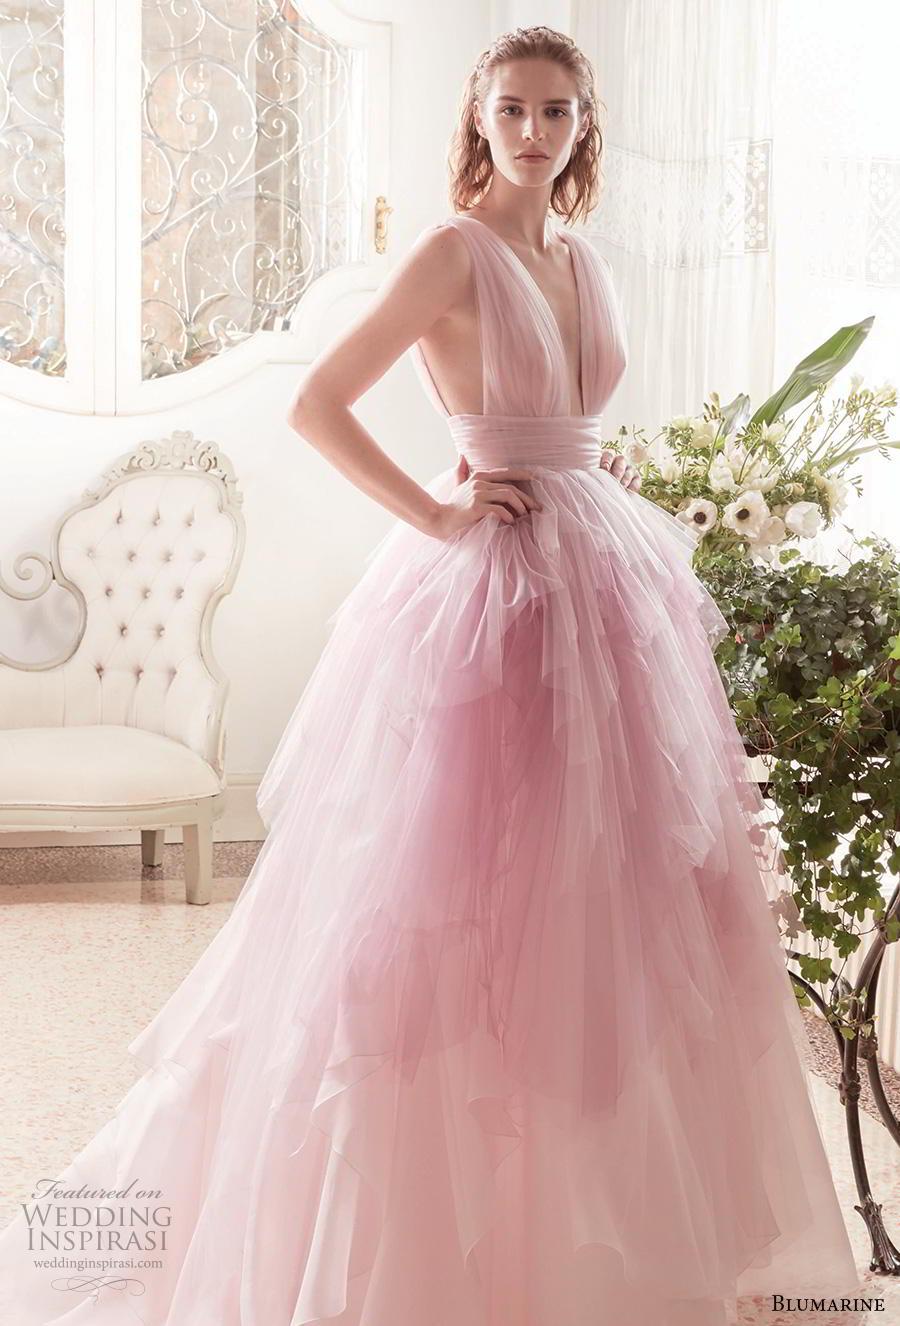 blumarine sposa 2019 bridal sleeveless deep v neck ruched bodice tiered tulle skirt romantic pink blush wedding dress v back chapel train (12) mv